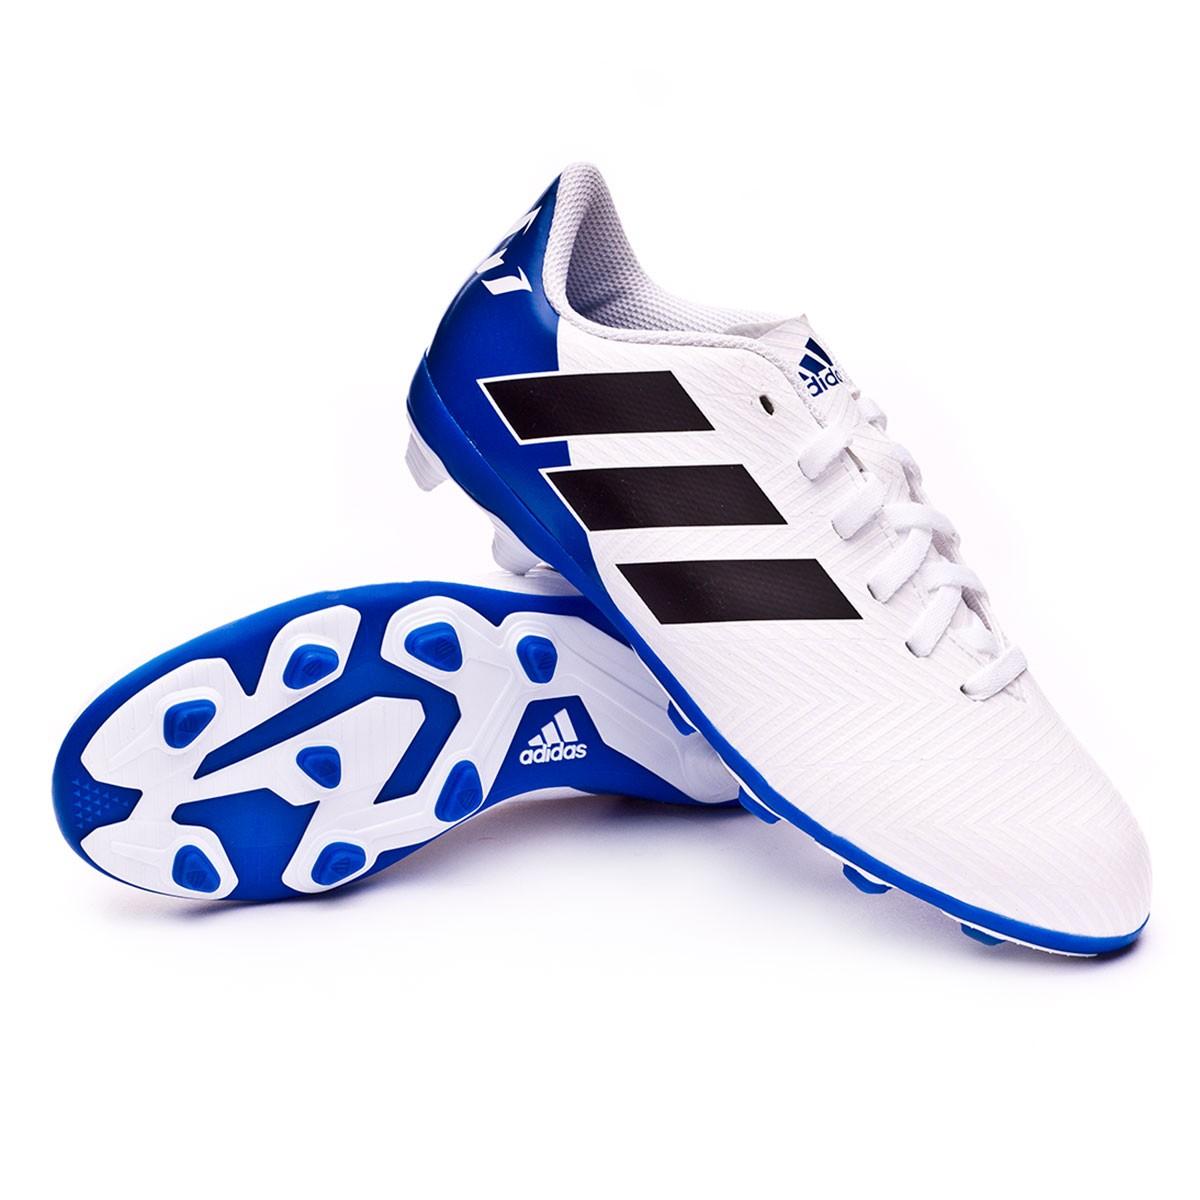 6bde829ad934 Football Boots adidas Nemeziz Messi 18.4 FG White-Core black-Football blue  - Football store Fútbol Emotion